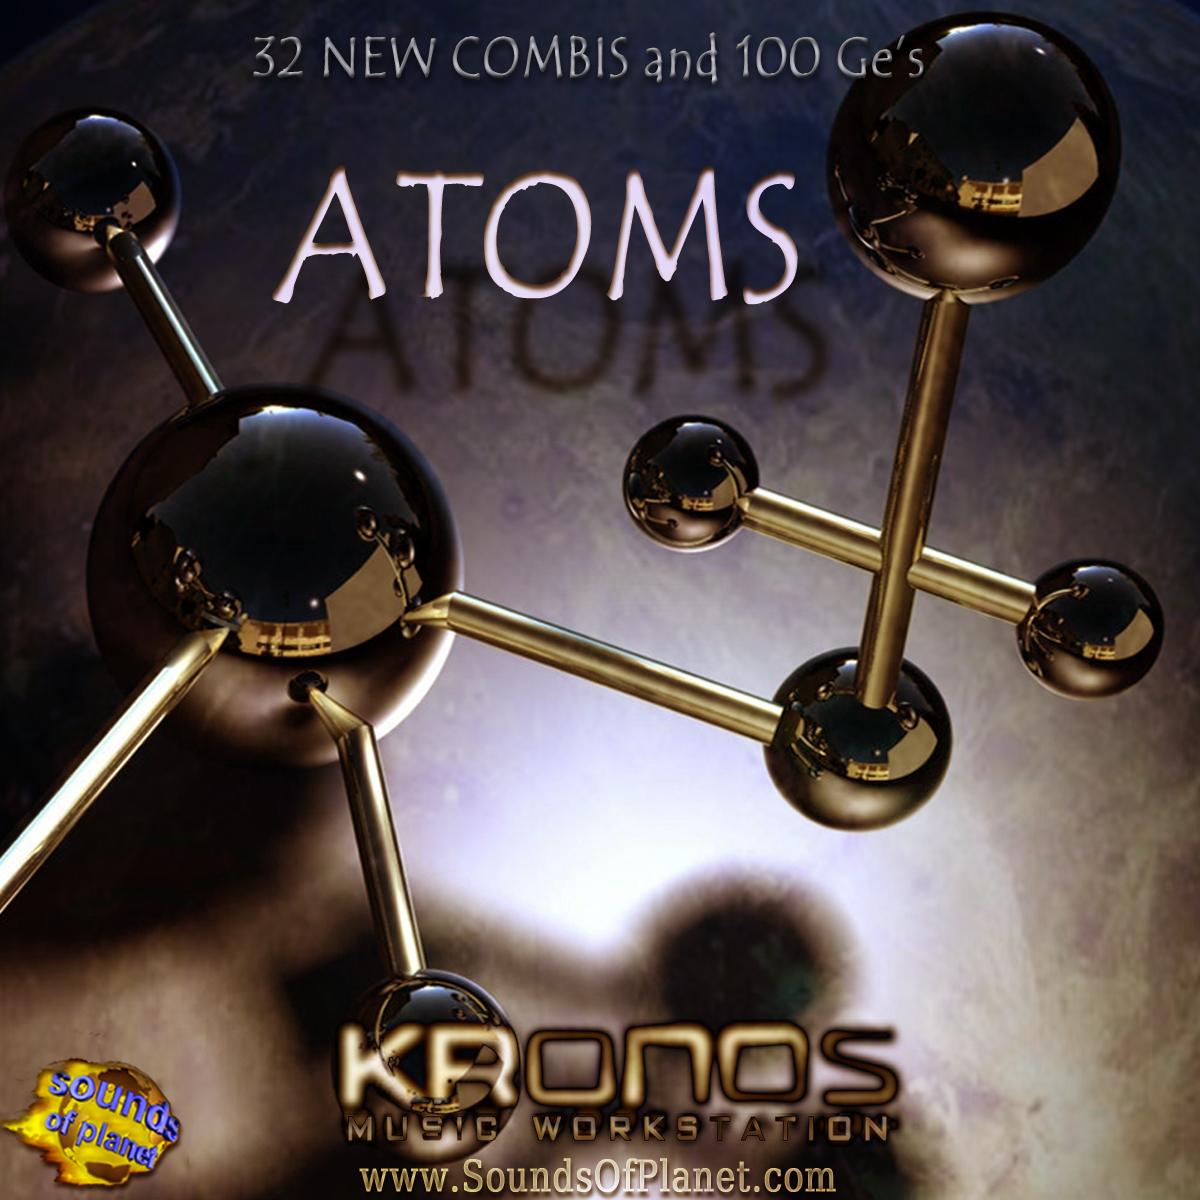 ATOMS Kronos 2 :: Soundsofplanet